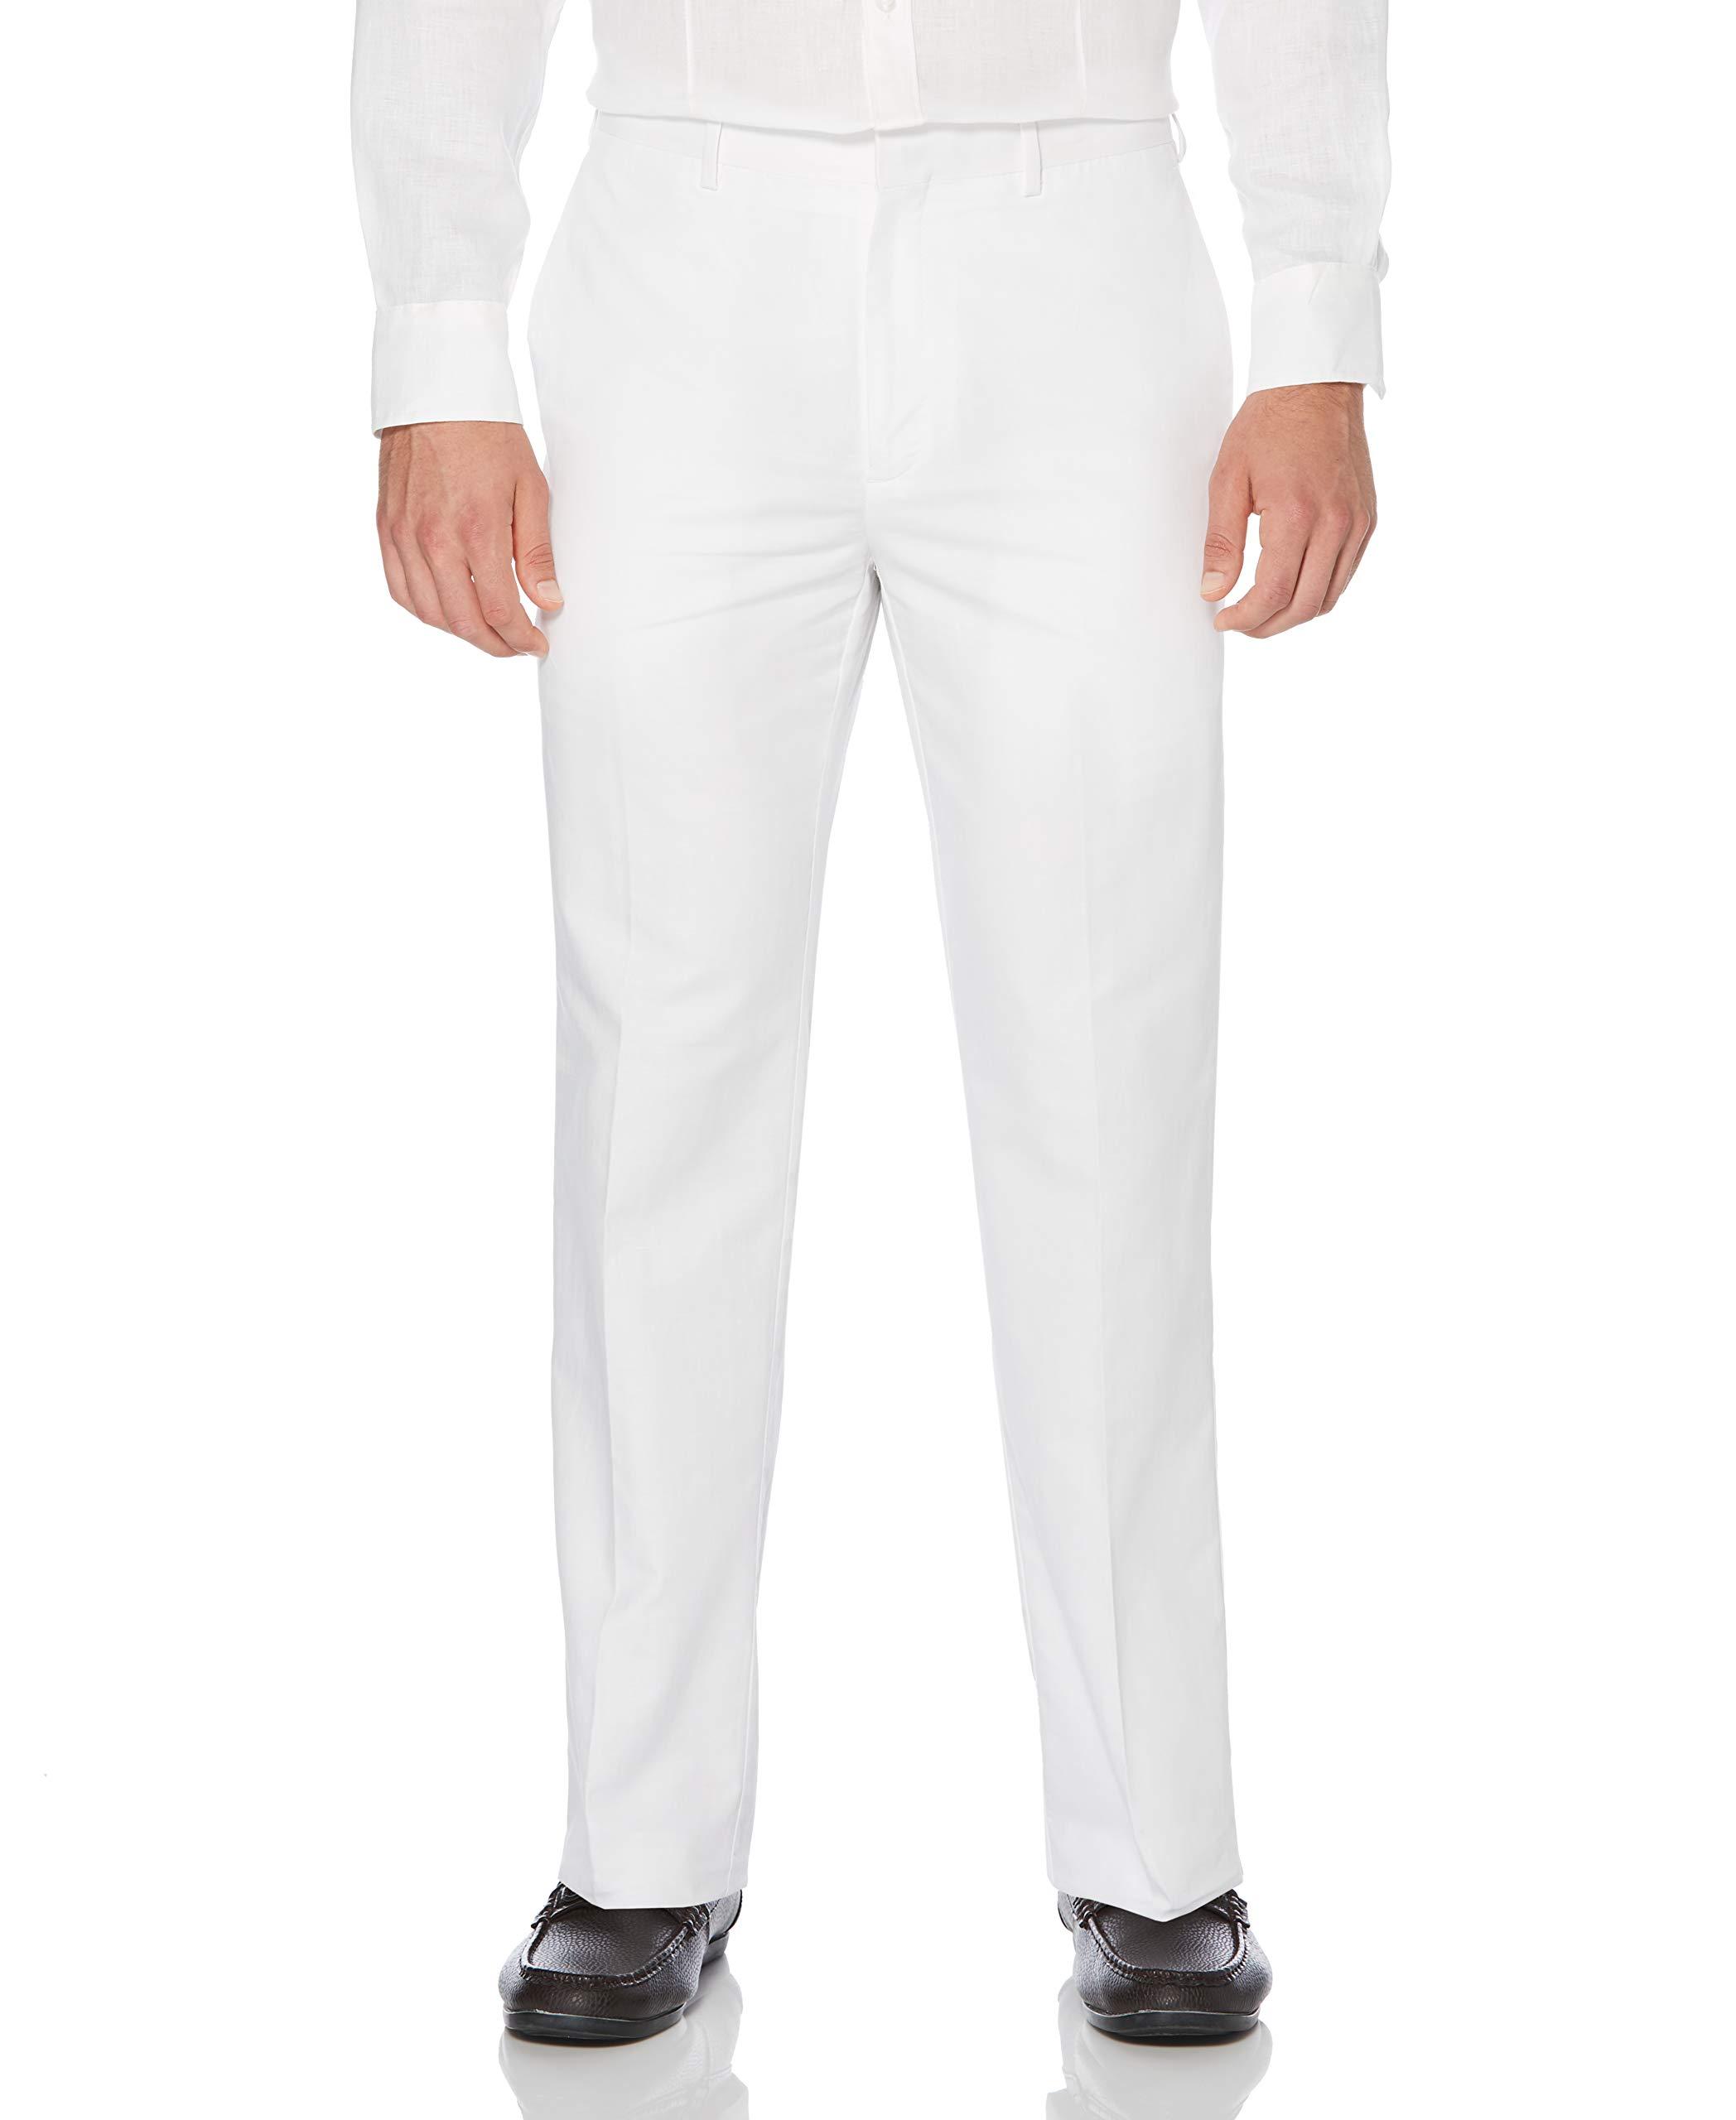 Cubavera Men's Big and Tall Linen-Cotton Herringbone-Textured Pant, Bright White, 46W X 30L